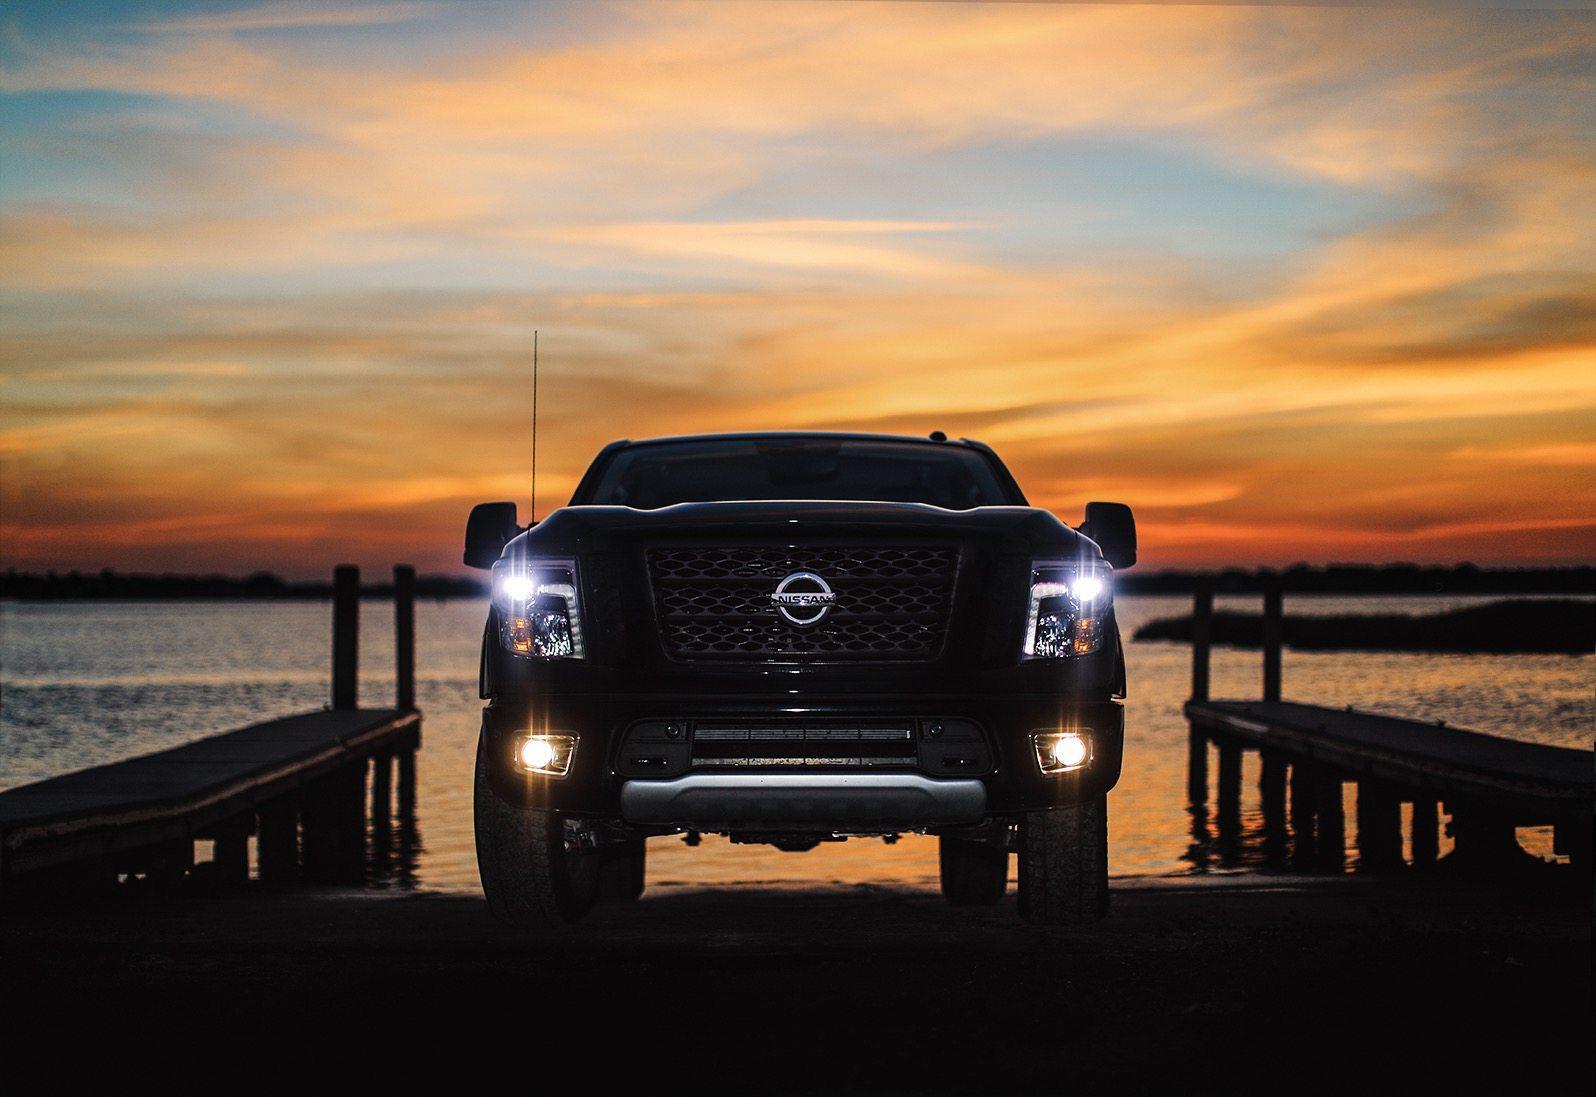 2018 Nissan Titan - Image: Nissan